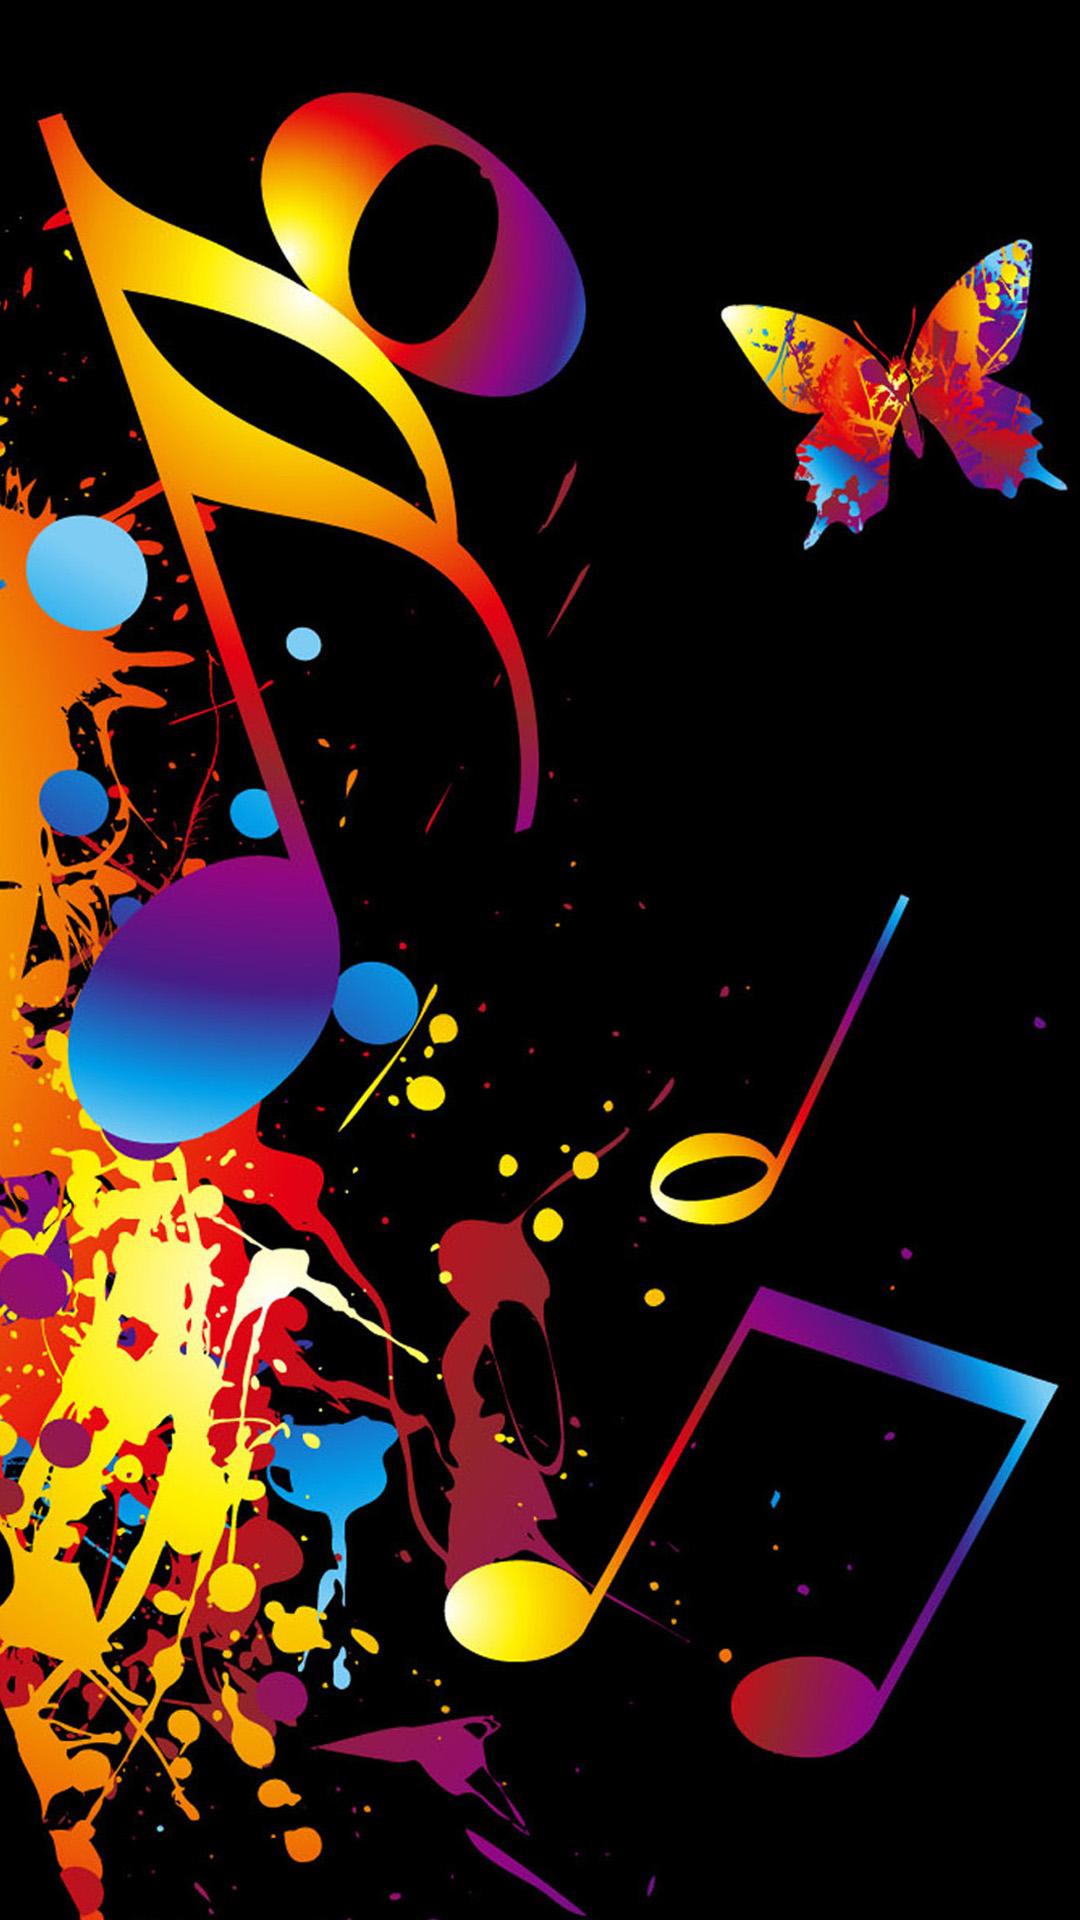 Music Theme Wallpaper Music Iphone Cool Wallpaper Cool 1080x1920 Download Hd Wallpaper Wallpapertip